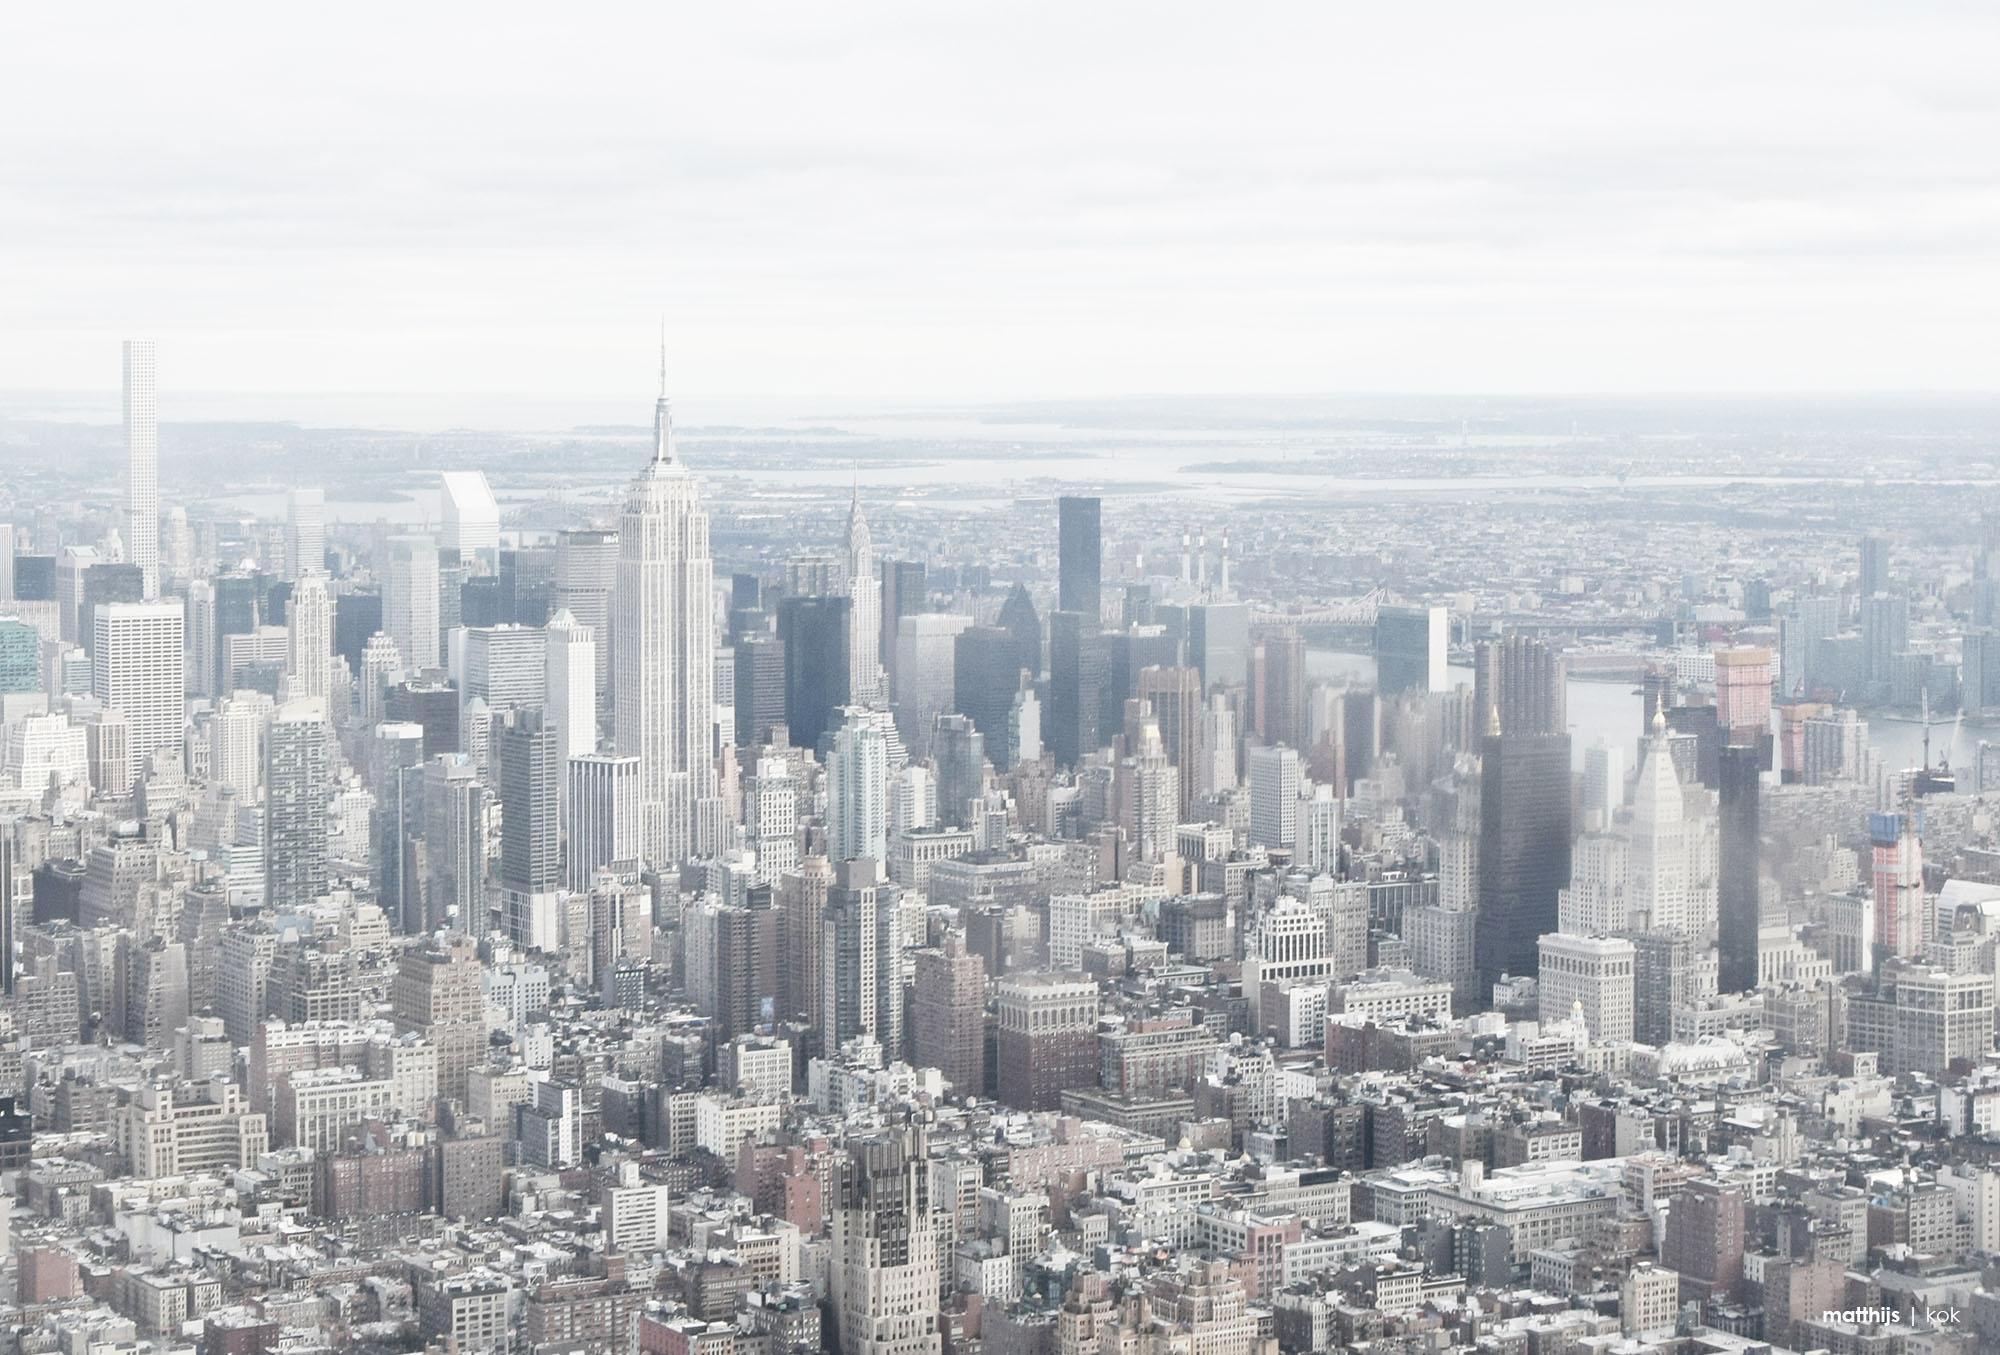 Downtown Manhattan, New York | Photo by Matthijs Kok